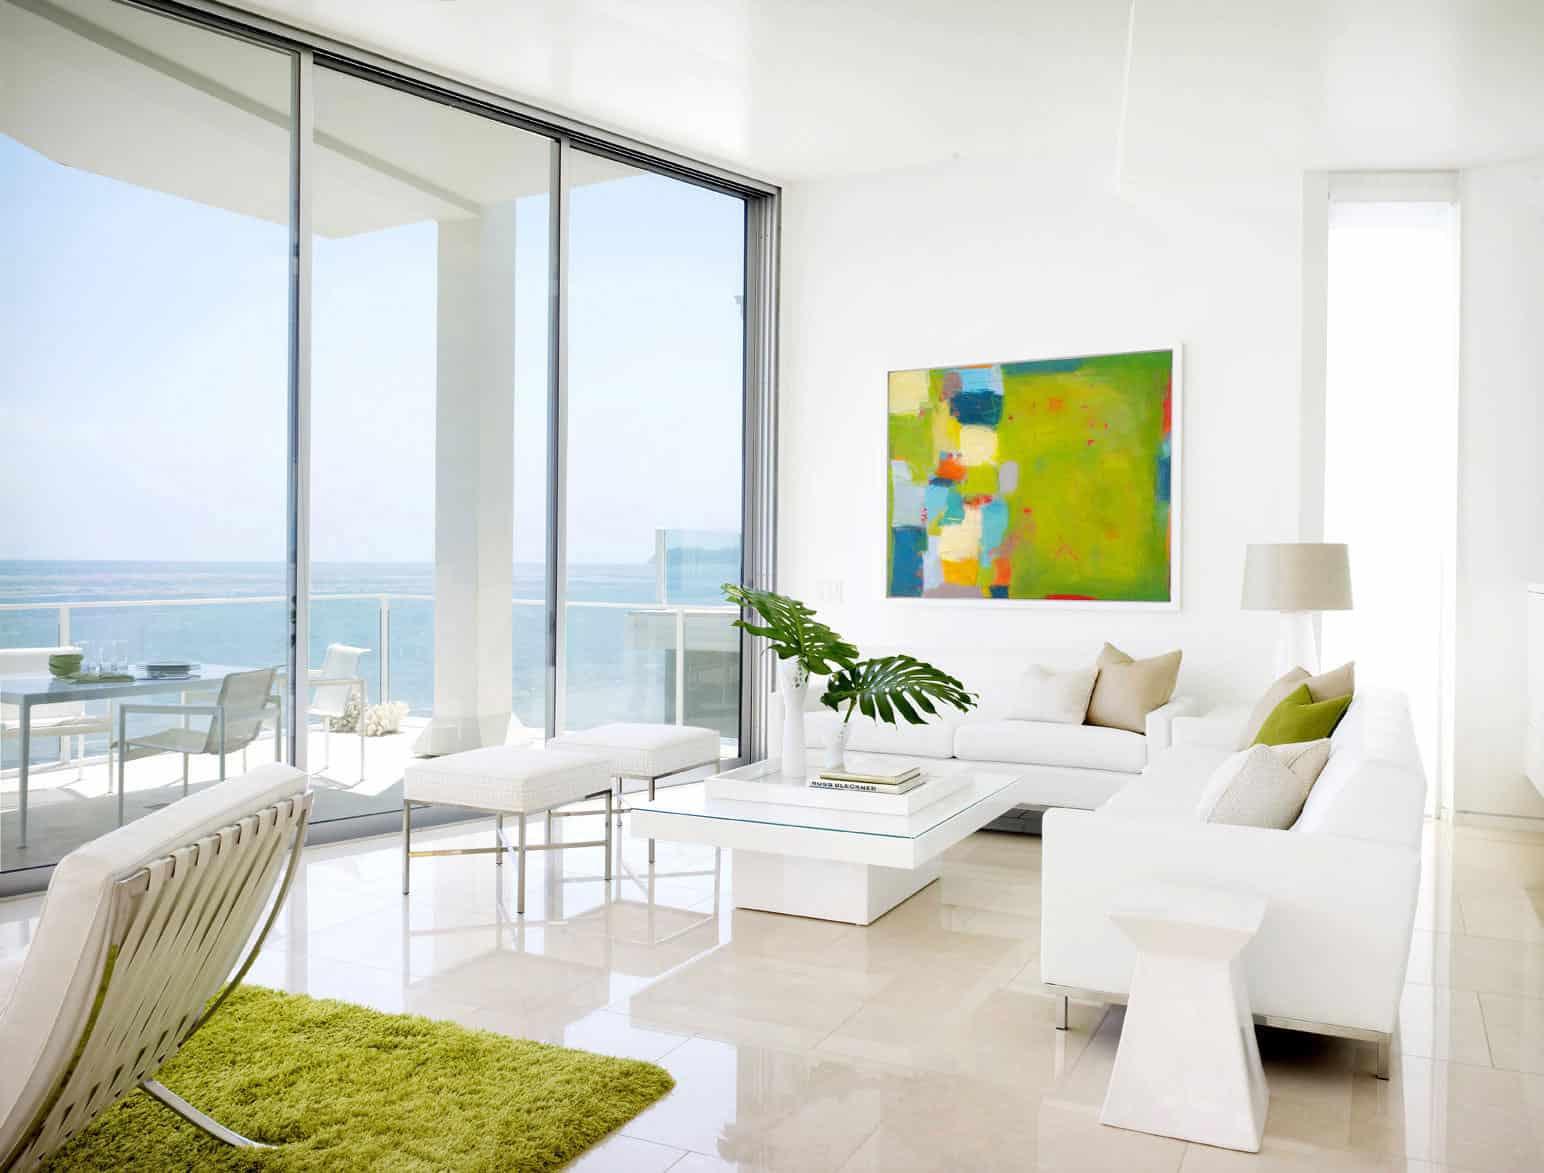 Malibu Beach House by Jamie Bush & Co. (4)